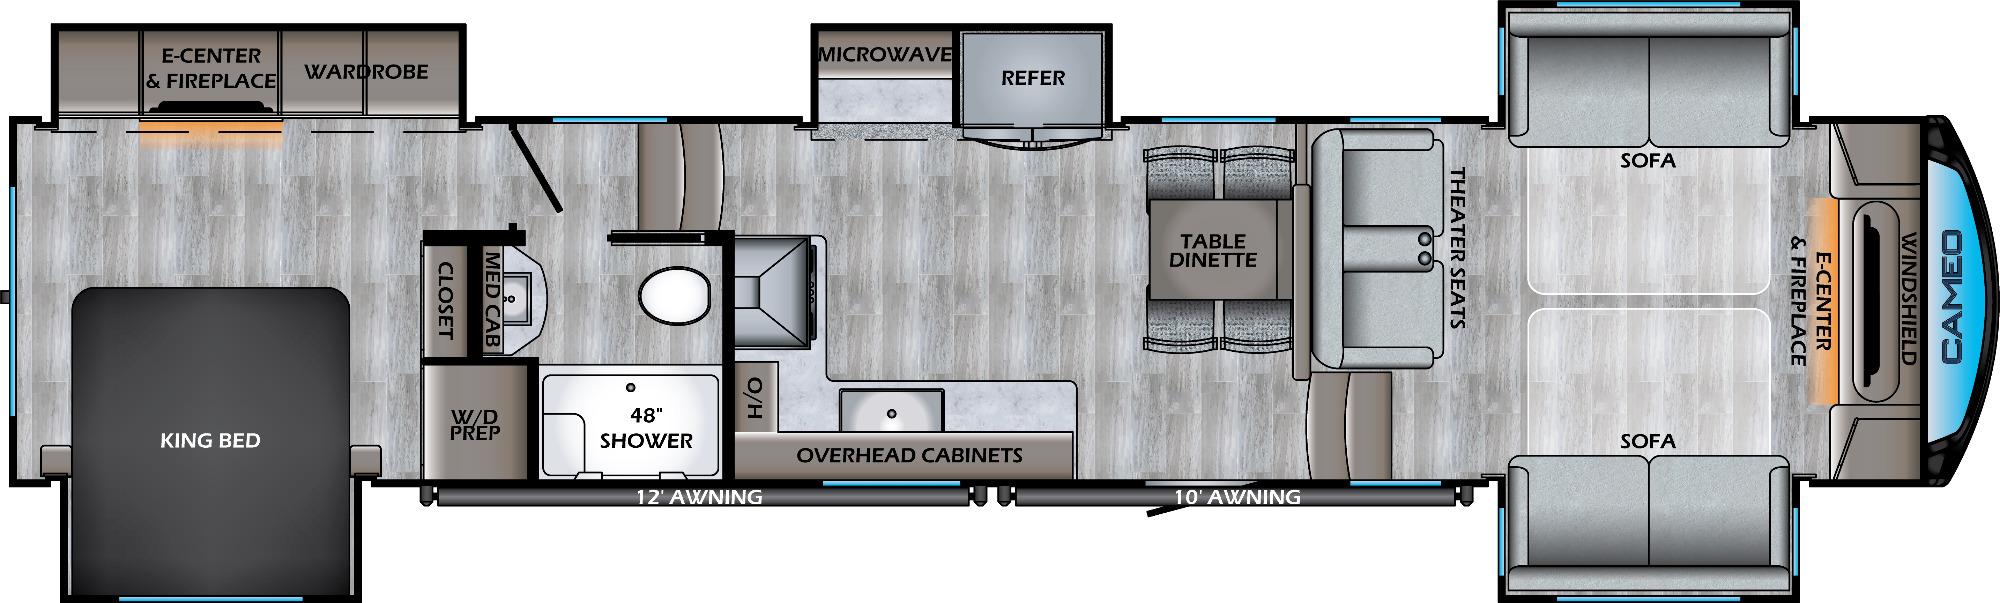 View Floor Plan for 2021 CROSSROADS CAMEO 4031FL